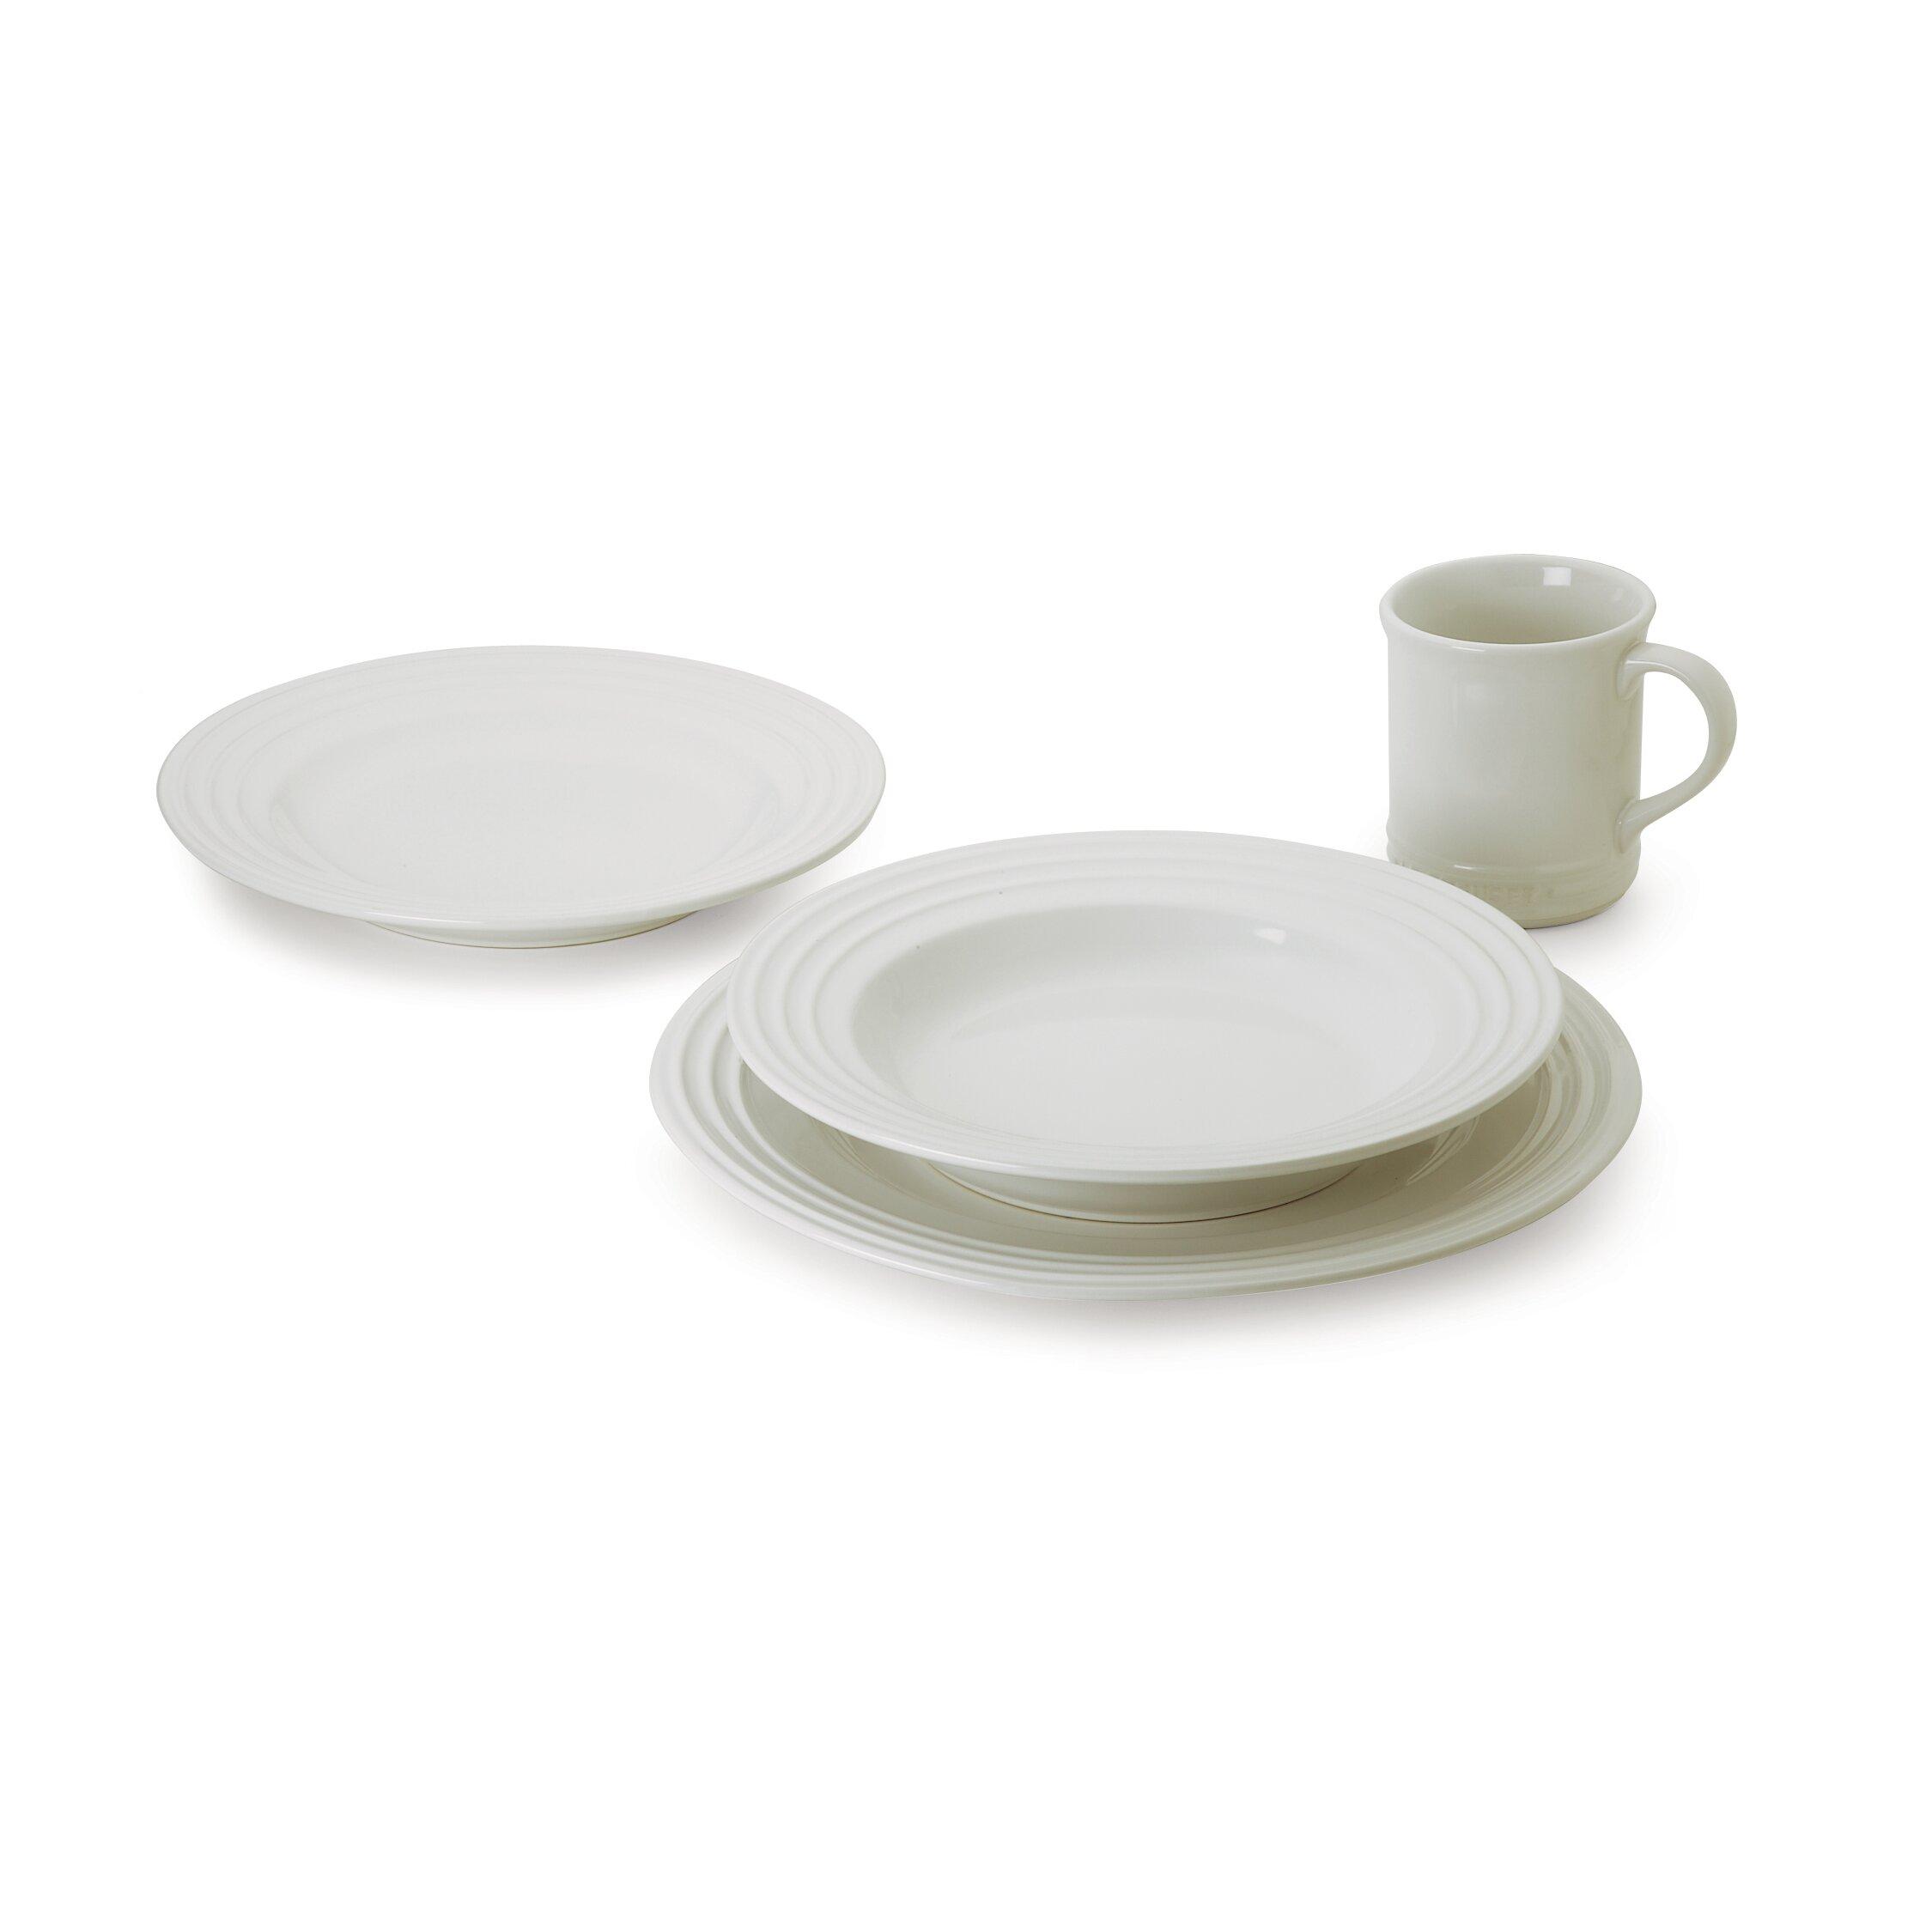 Le creuset stoneware 16 piece dinnerware set reviews for Kitchen dish sets